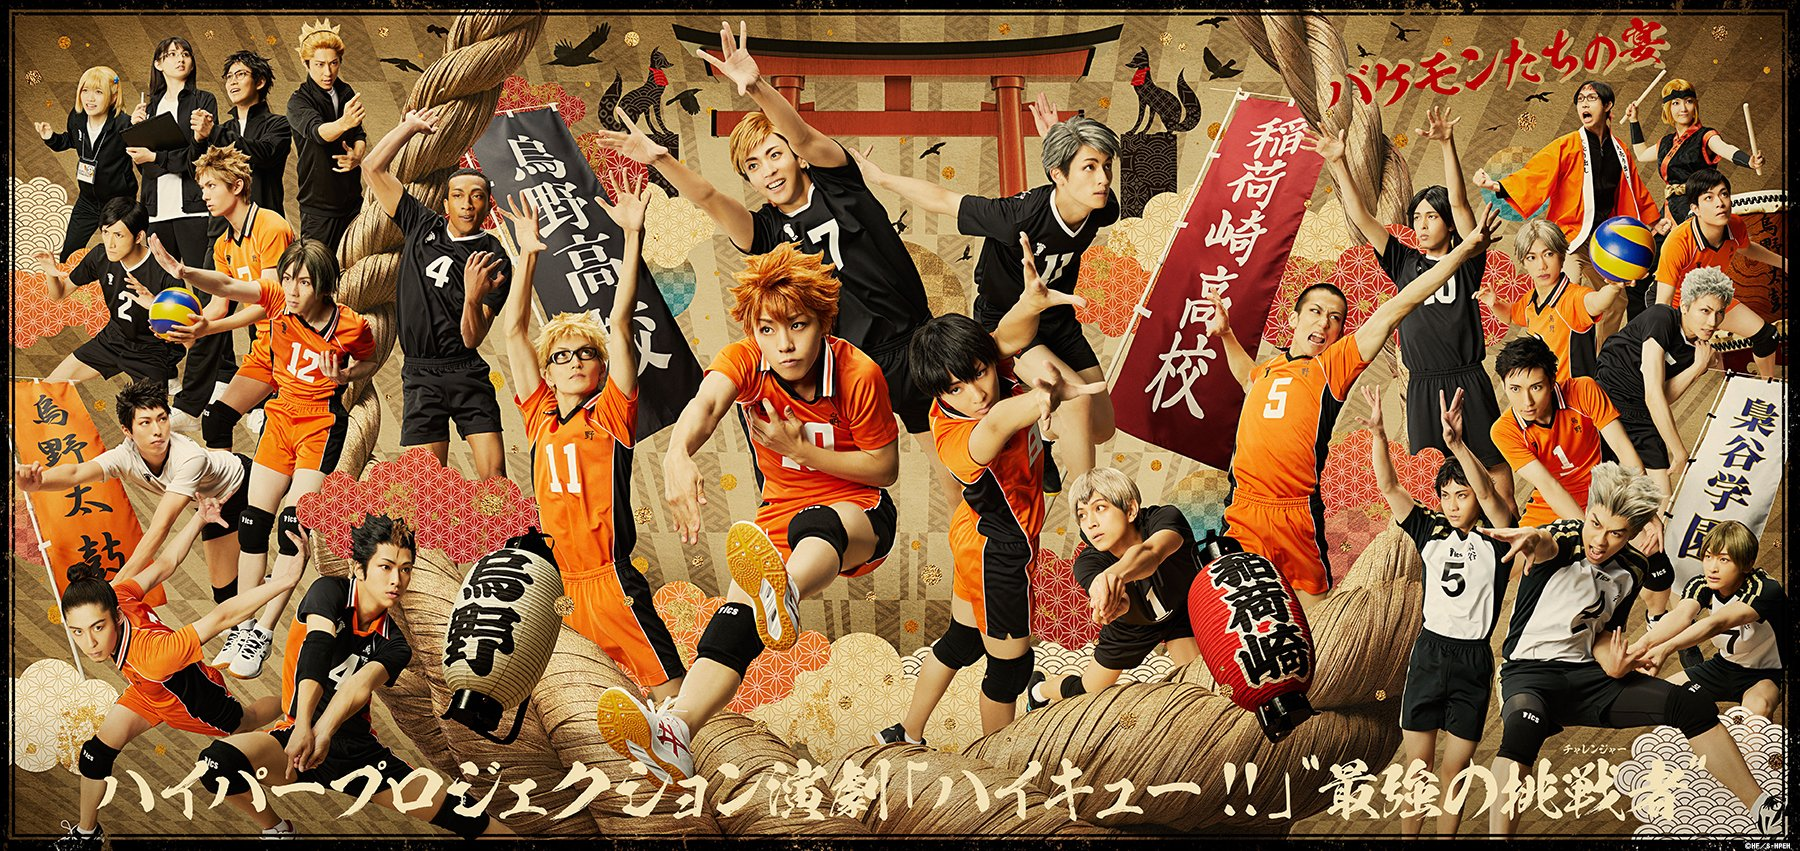 Saikyou no challenger poster 2.jpg